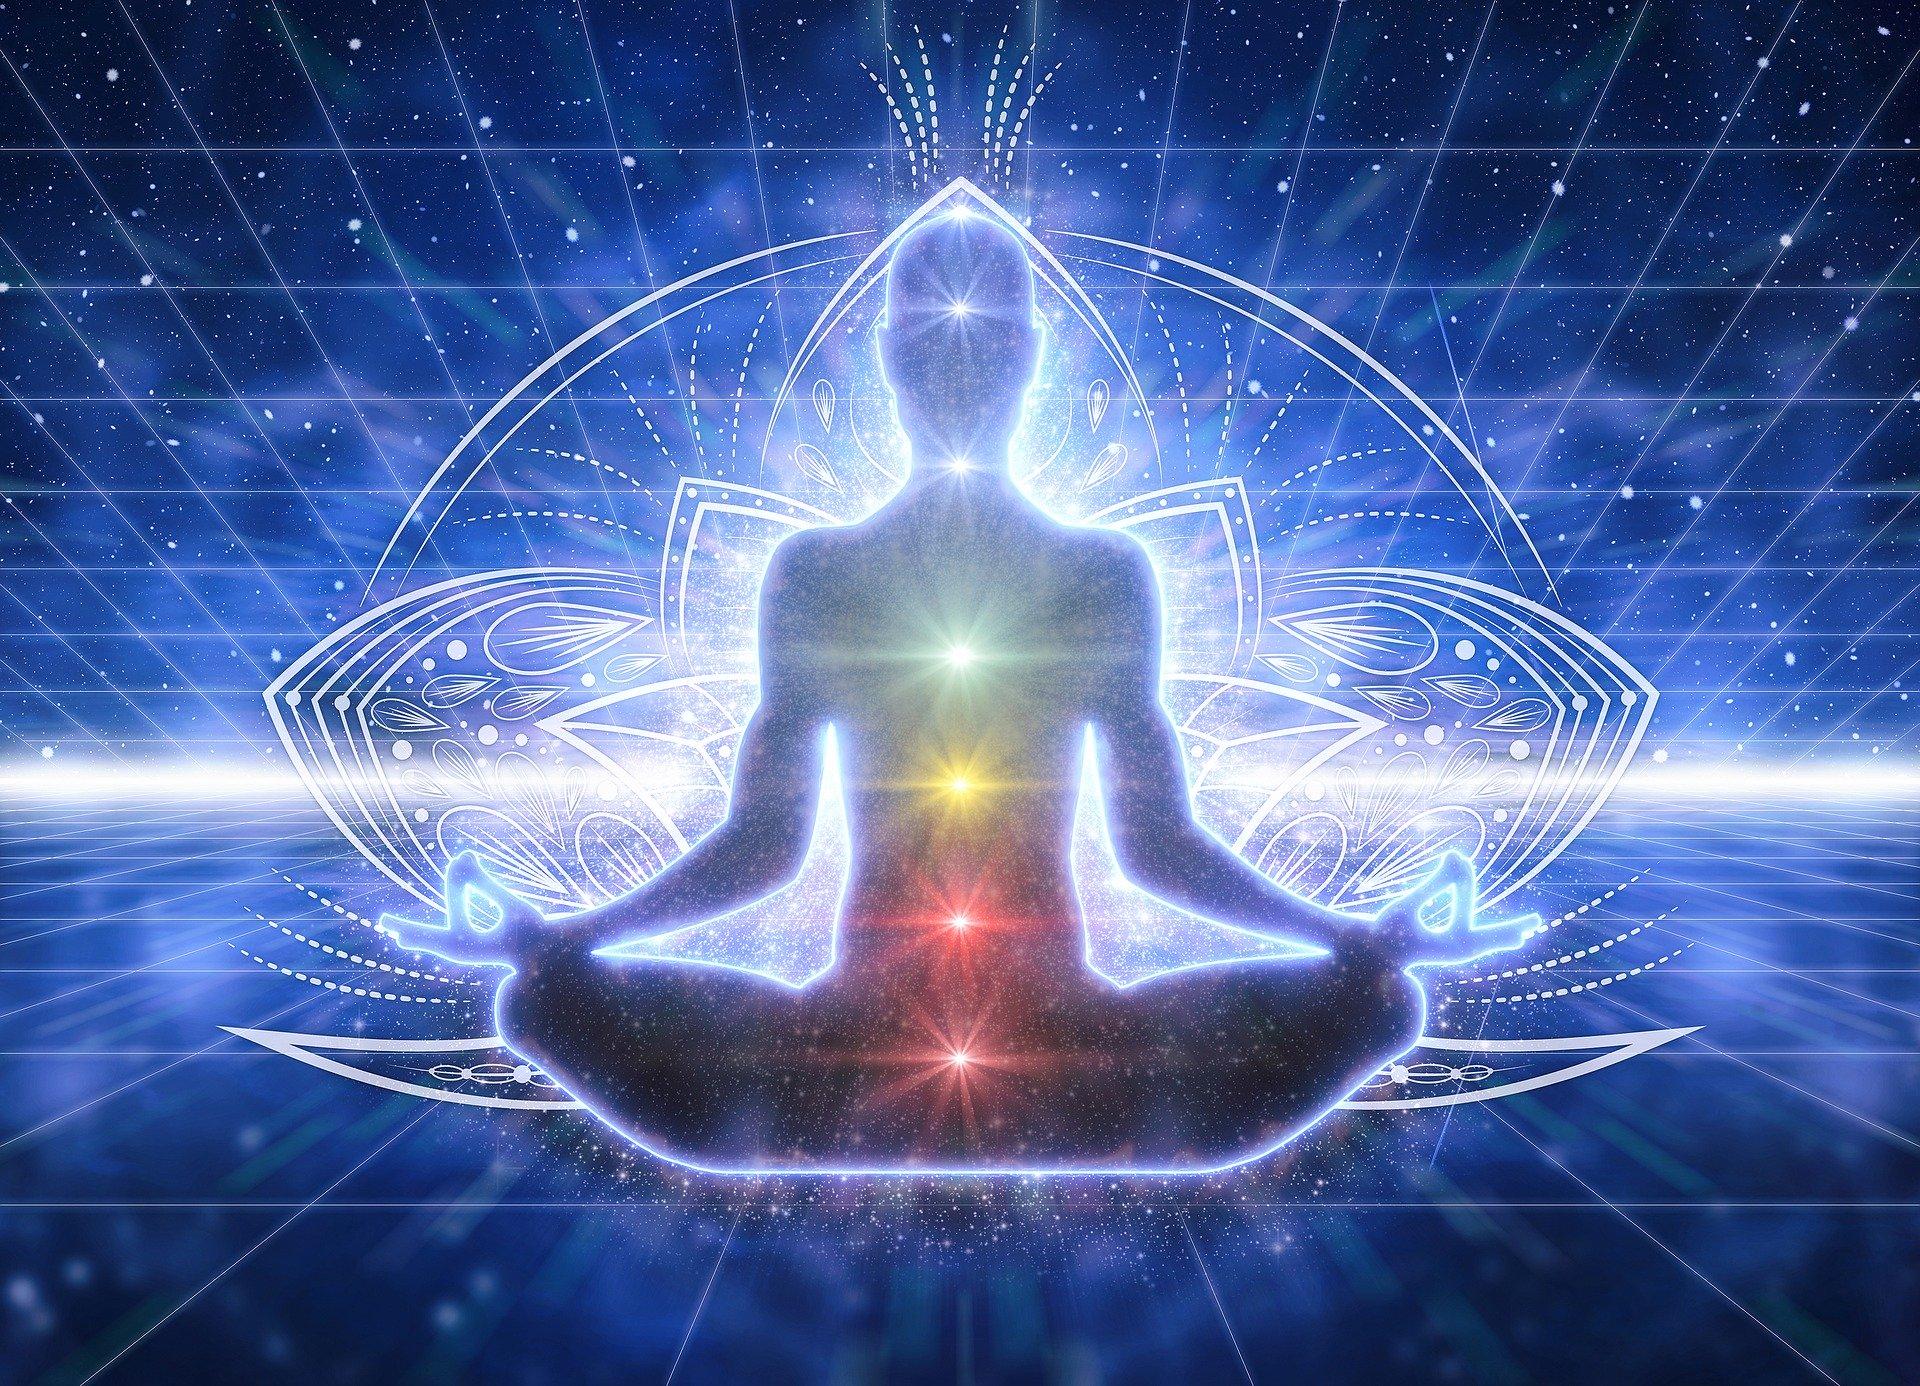 glanda pineala - sfatulparintilor.ro - pixabay-com - spiritualism-4552237_1920